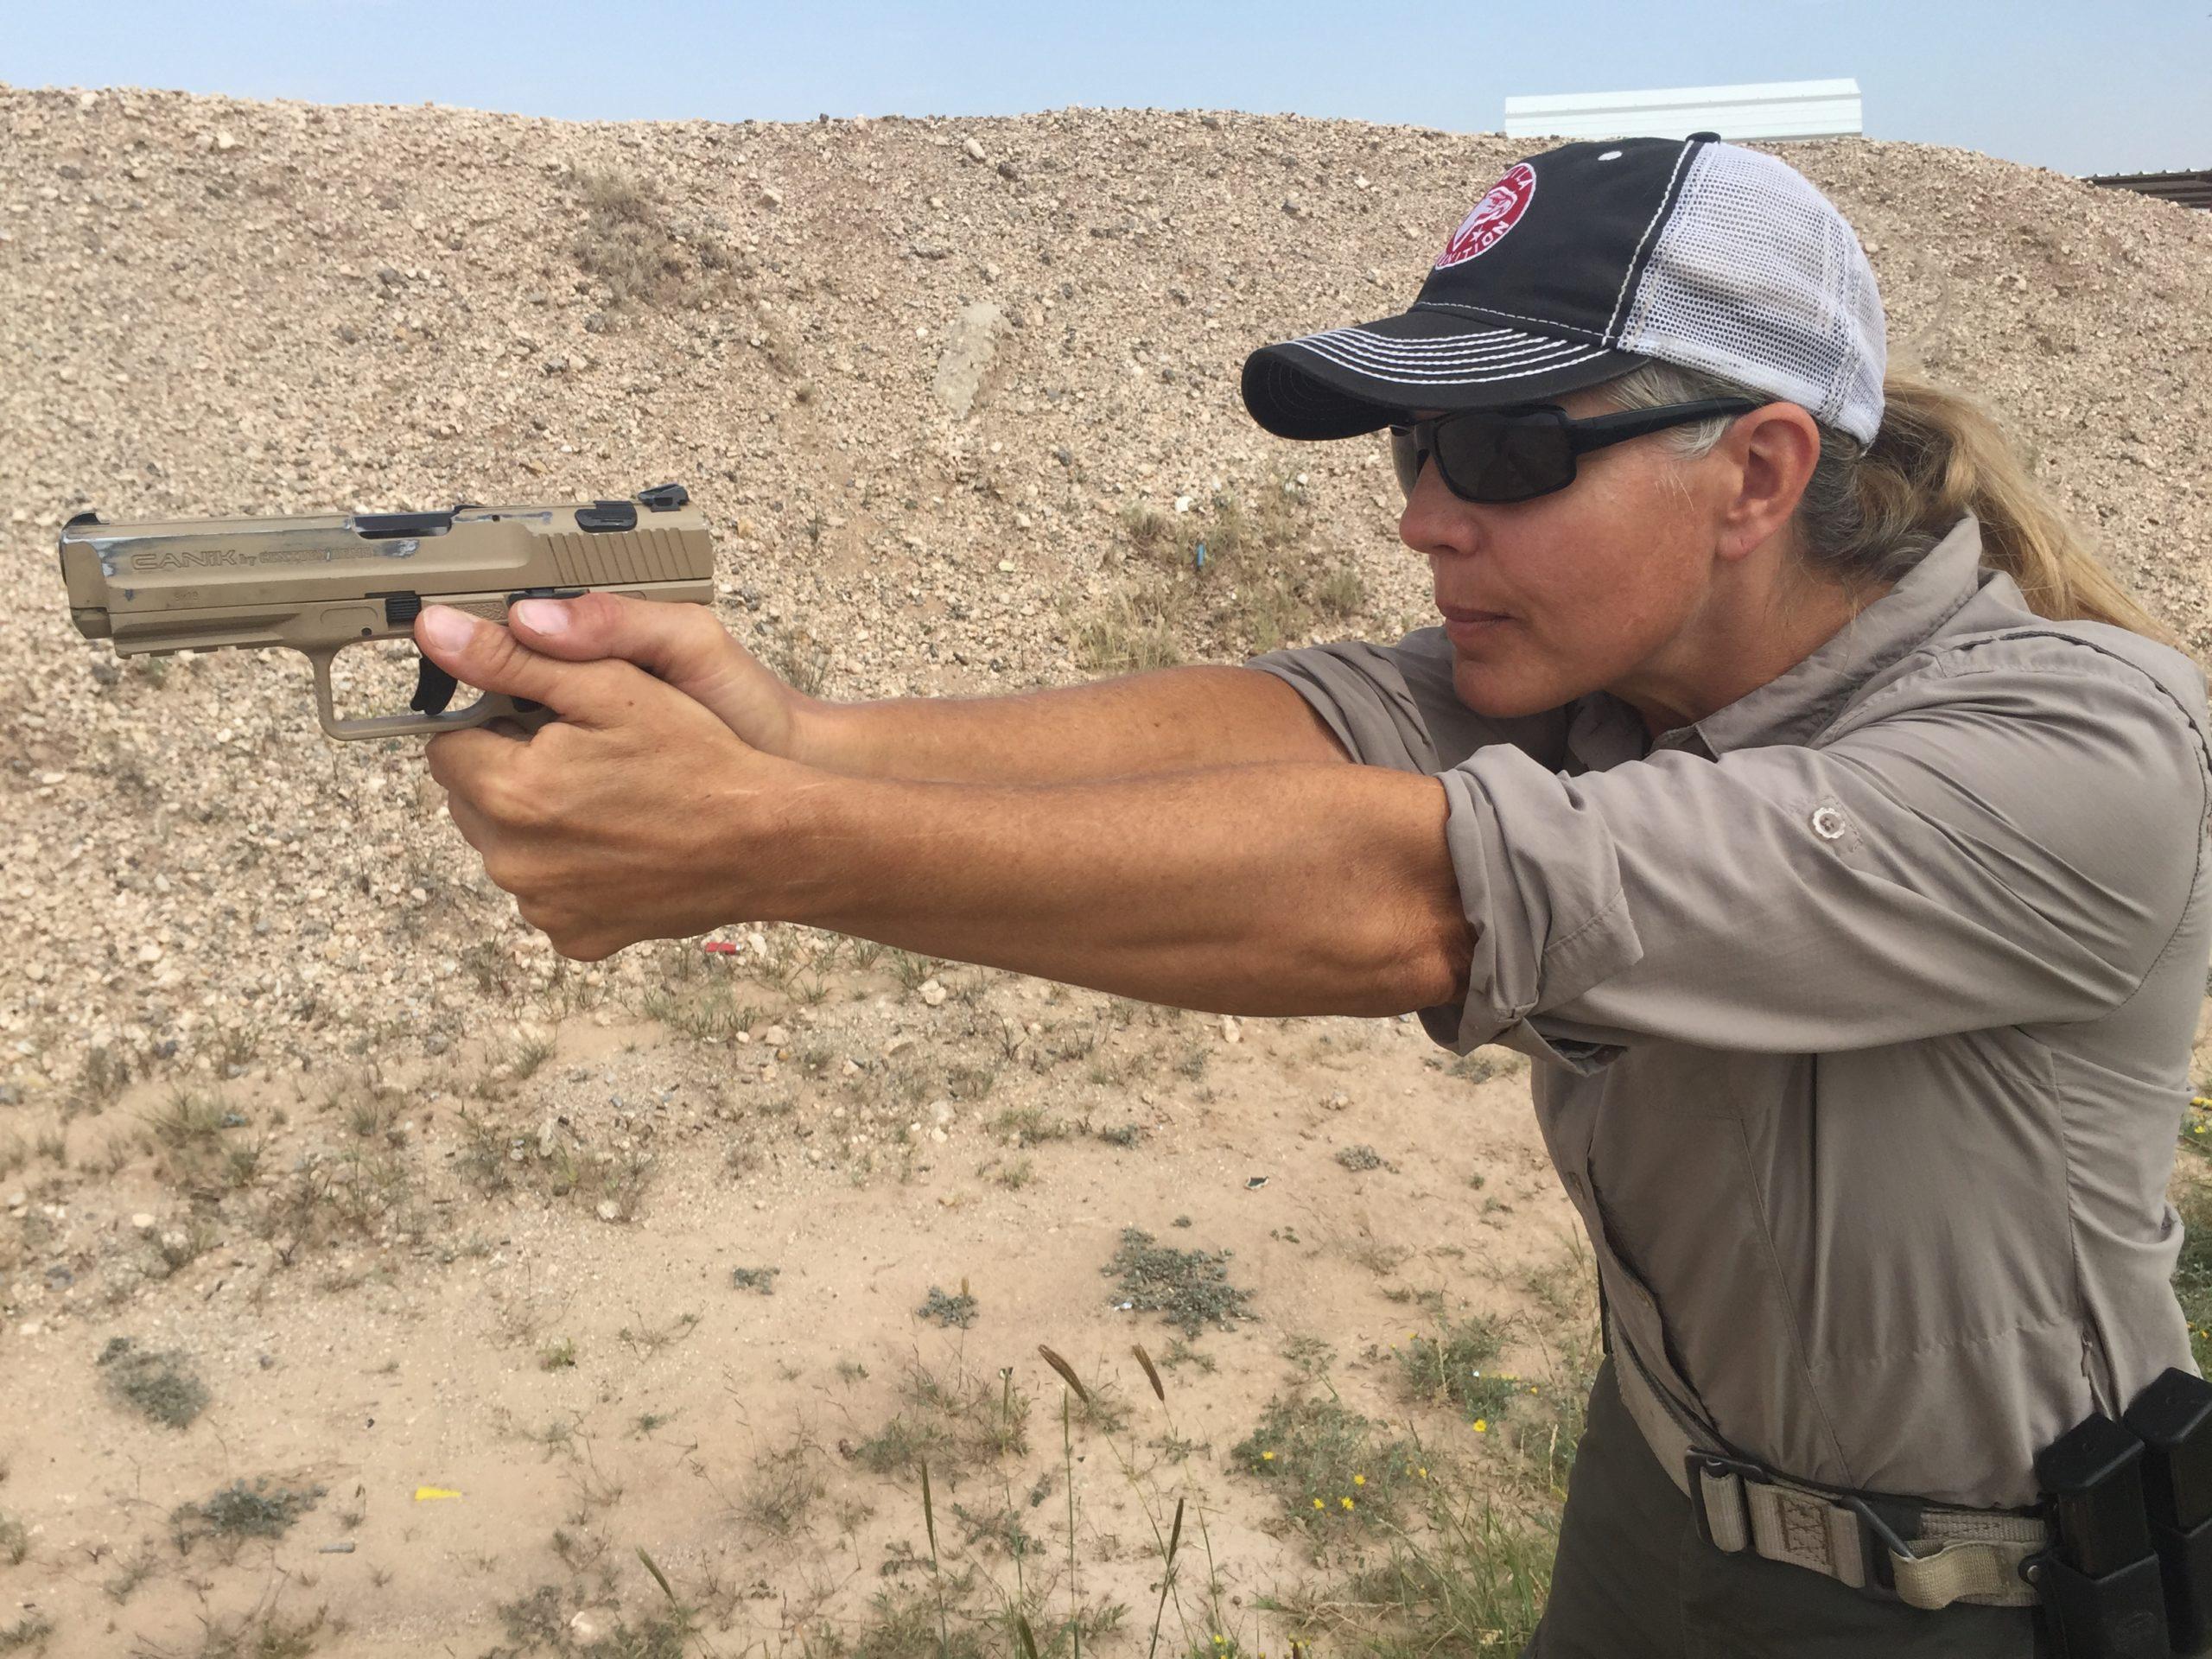 Defense Pistol – Ready Positions